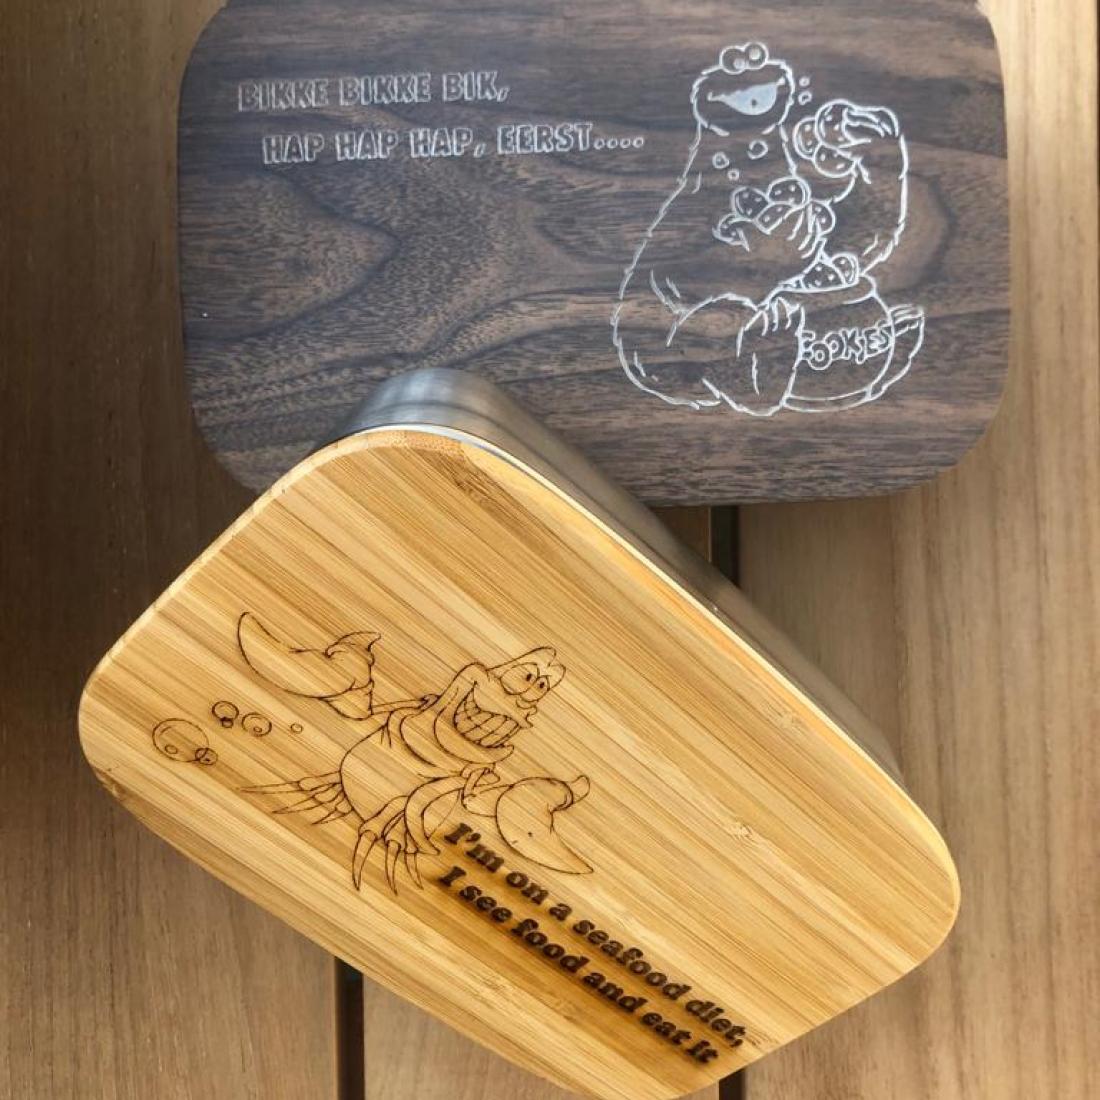 Sandwich box bamboo or aluminum